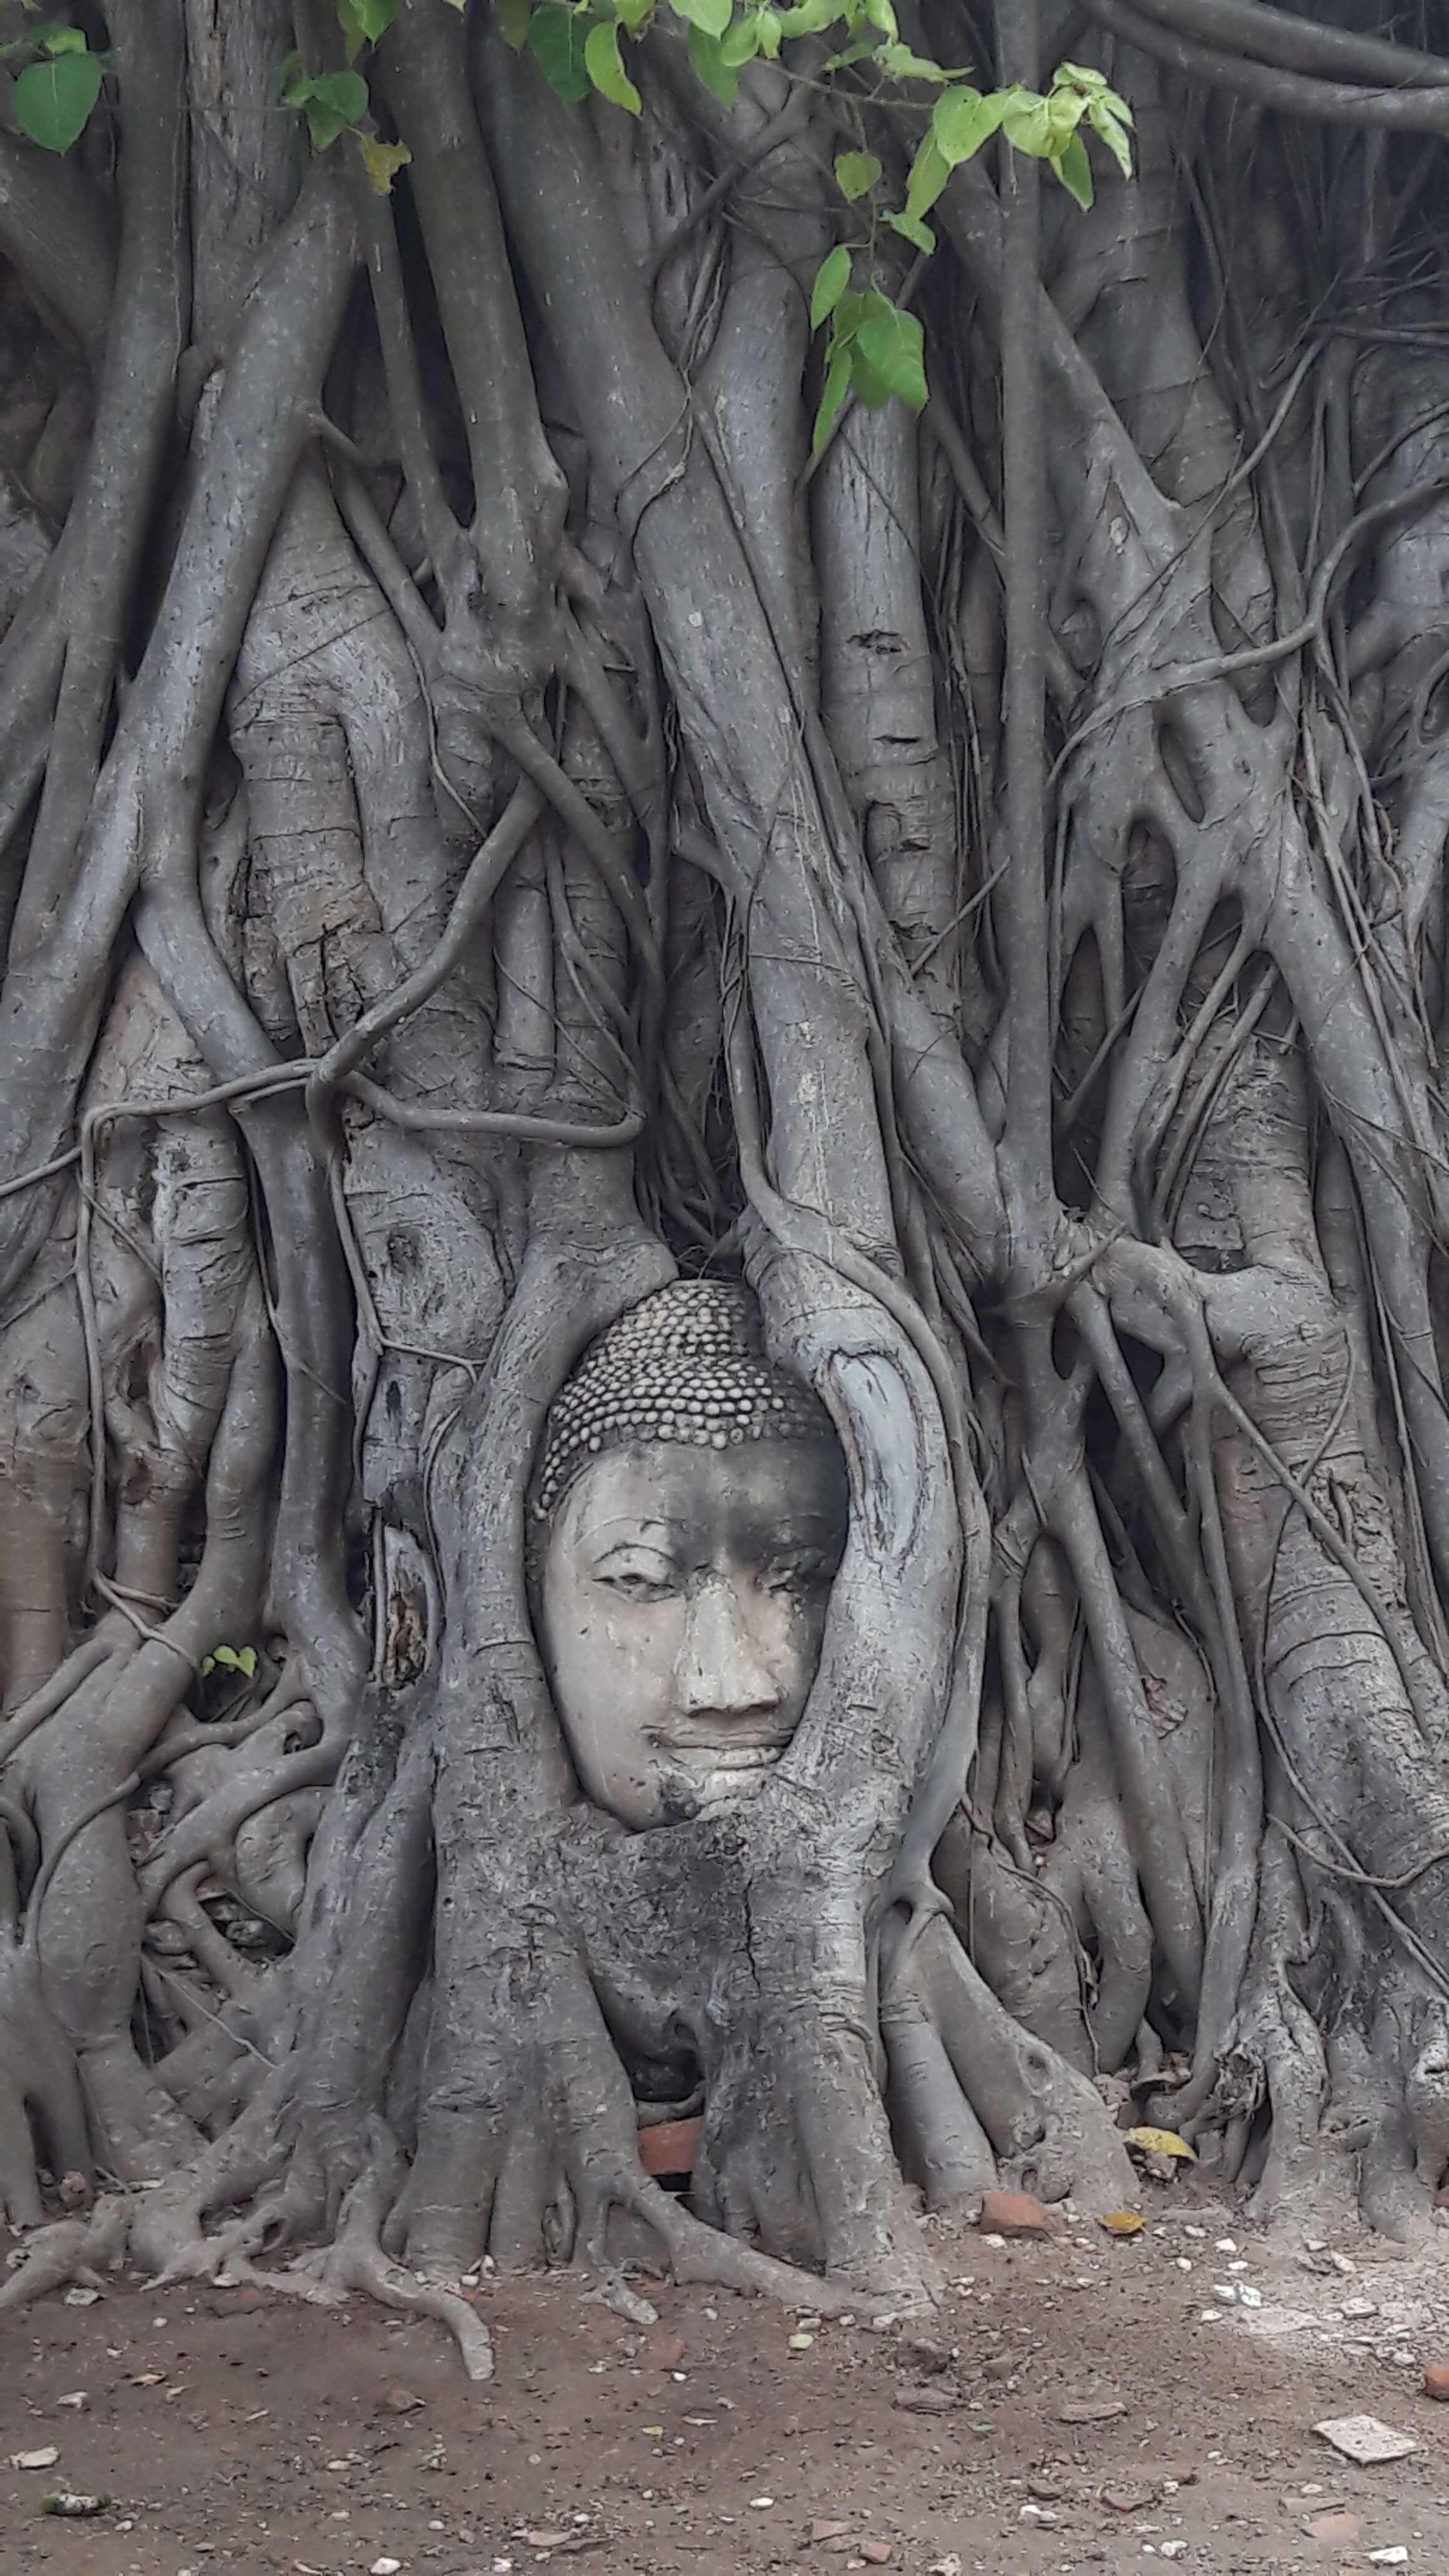 wat mahatat ayutthaya